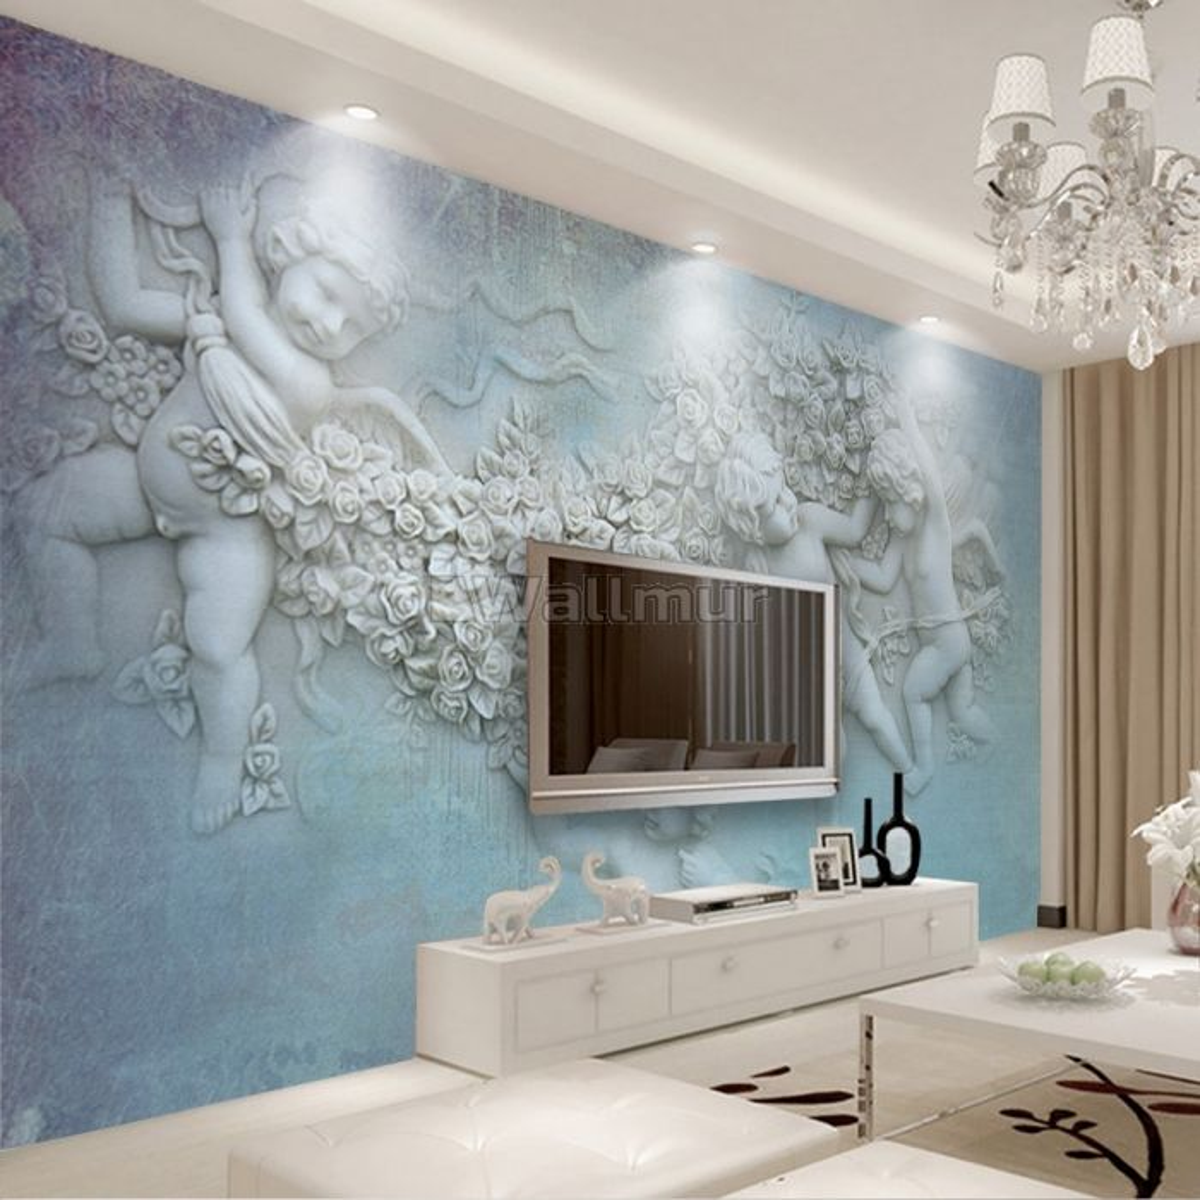 3D Look Angel Sculpture with Florals Wallpaper Mural